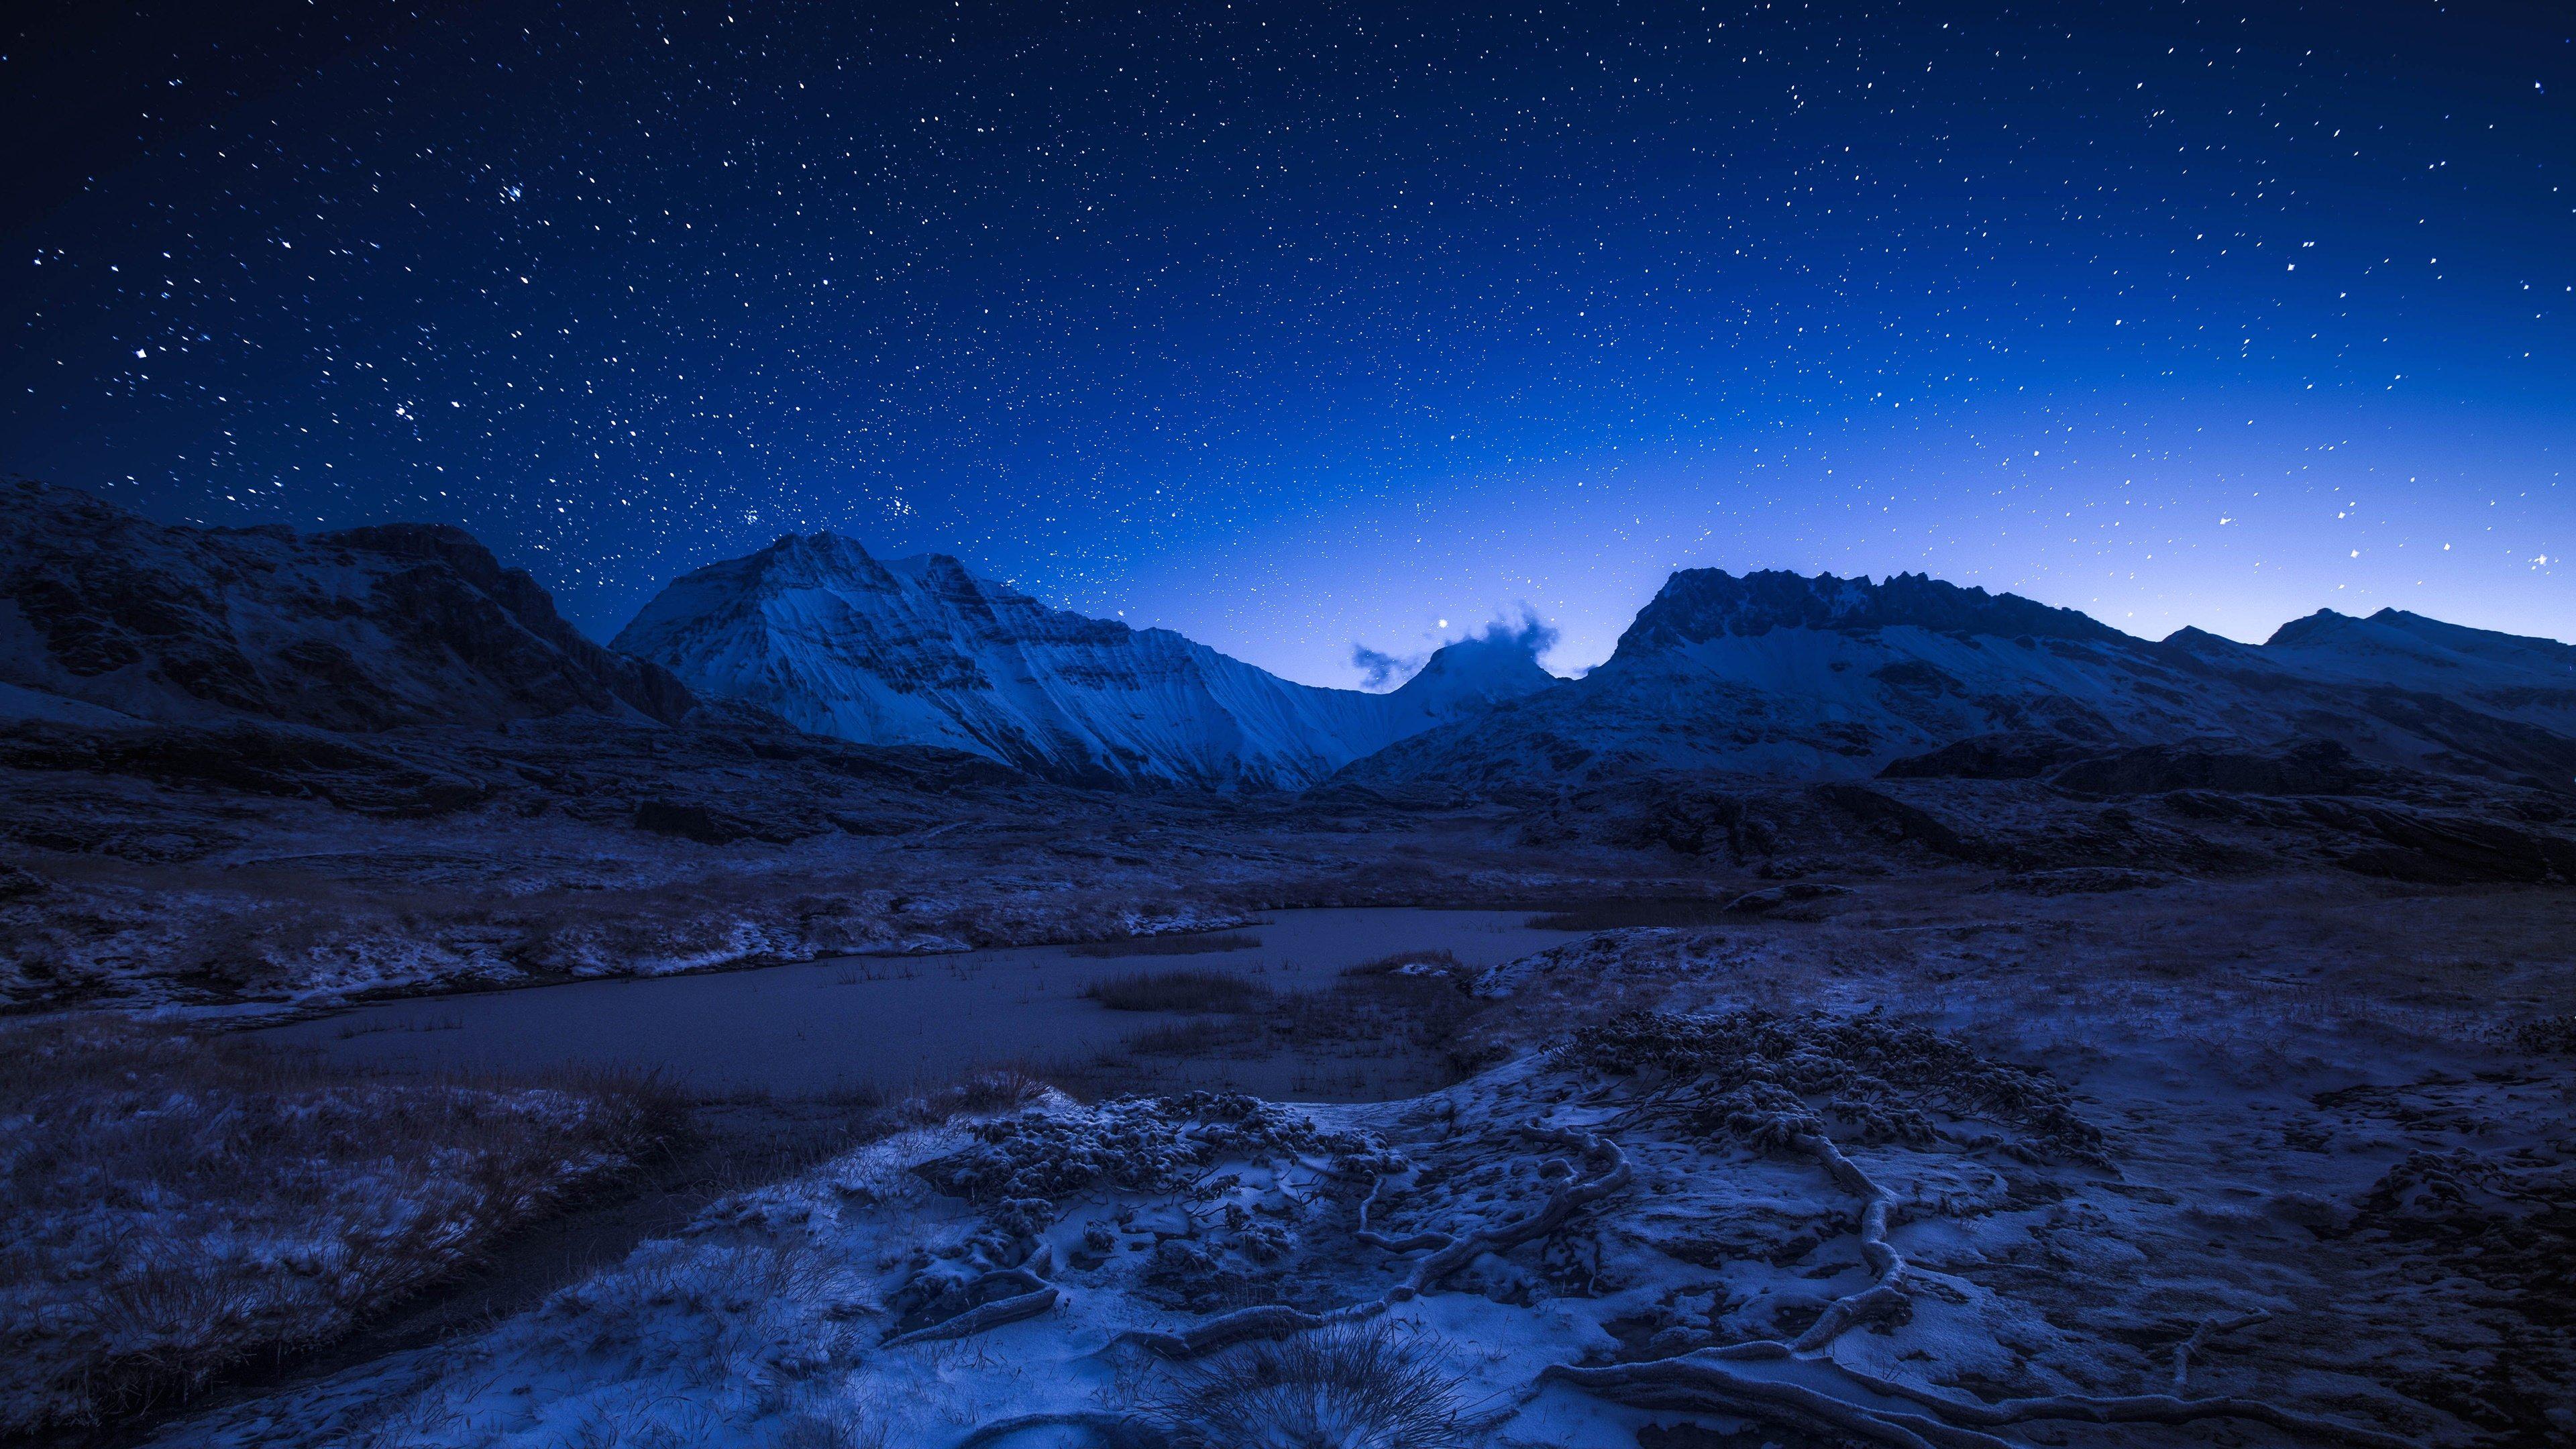 Fondos de pantalla Cielo estrellado en montañas nevadas